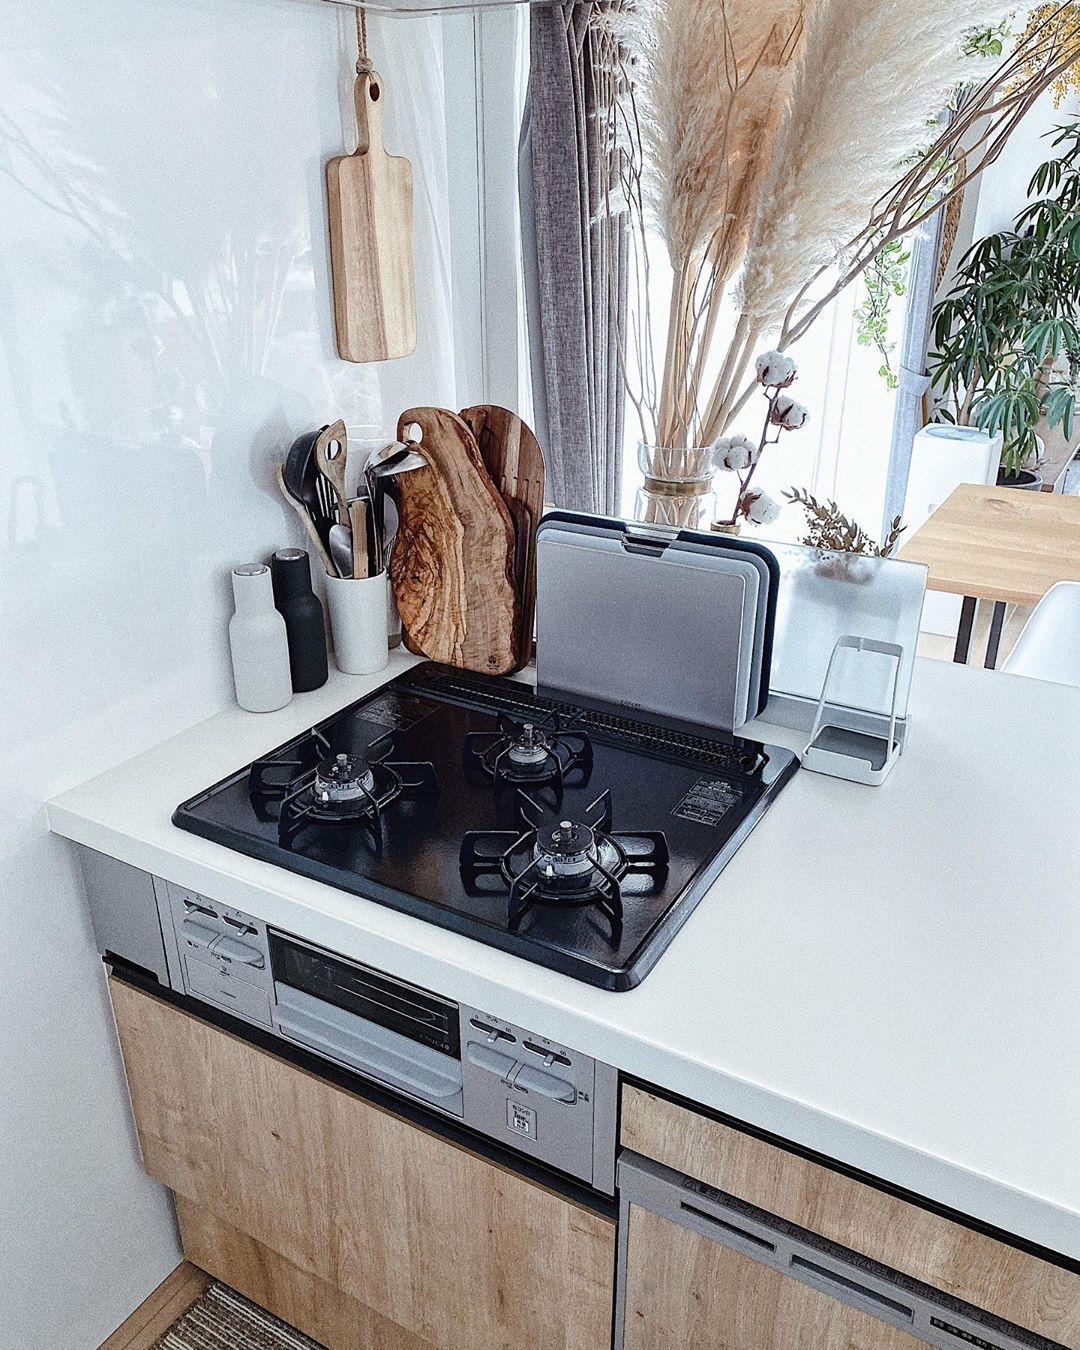 Jk Deℂoℝ On Instagram 調理器具収納について 我が家のコンロ下の調理器具収納は 基本的にリッチェルのトトノシリーズを使用 全体的にサイズ感が使いやすく 素材感もしなりのあるプラスチックで丈夫なので 気に入っていま 調理器具